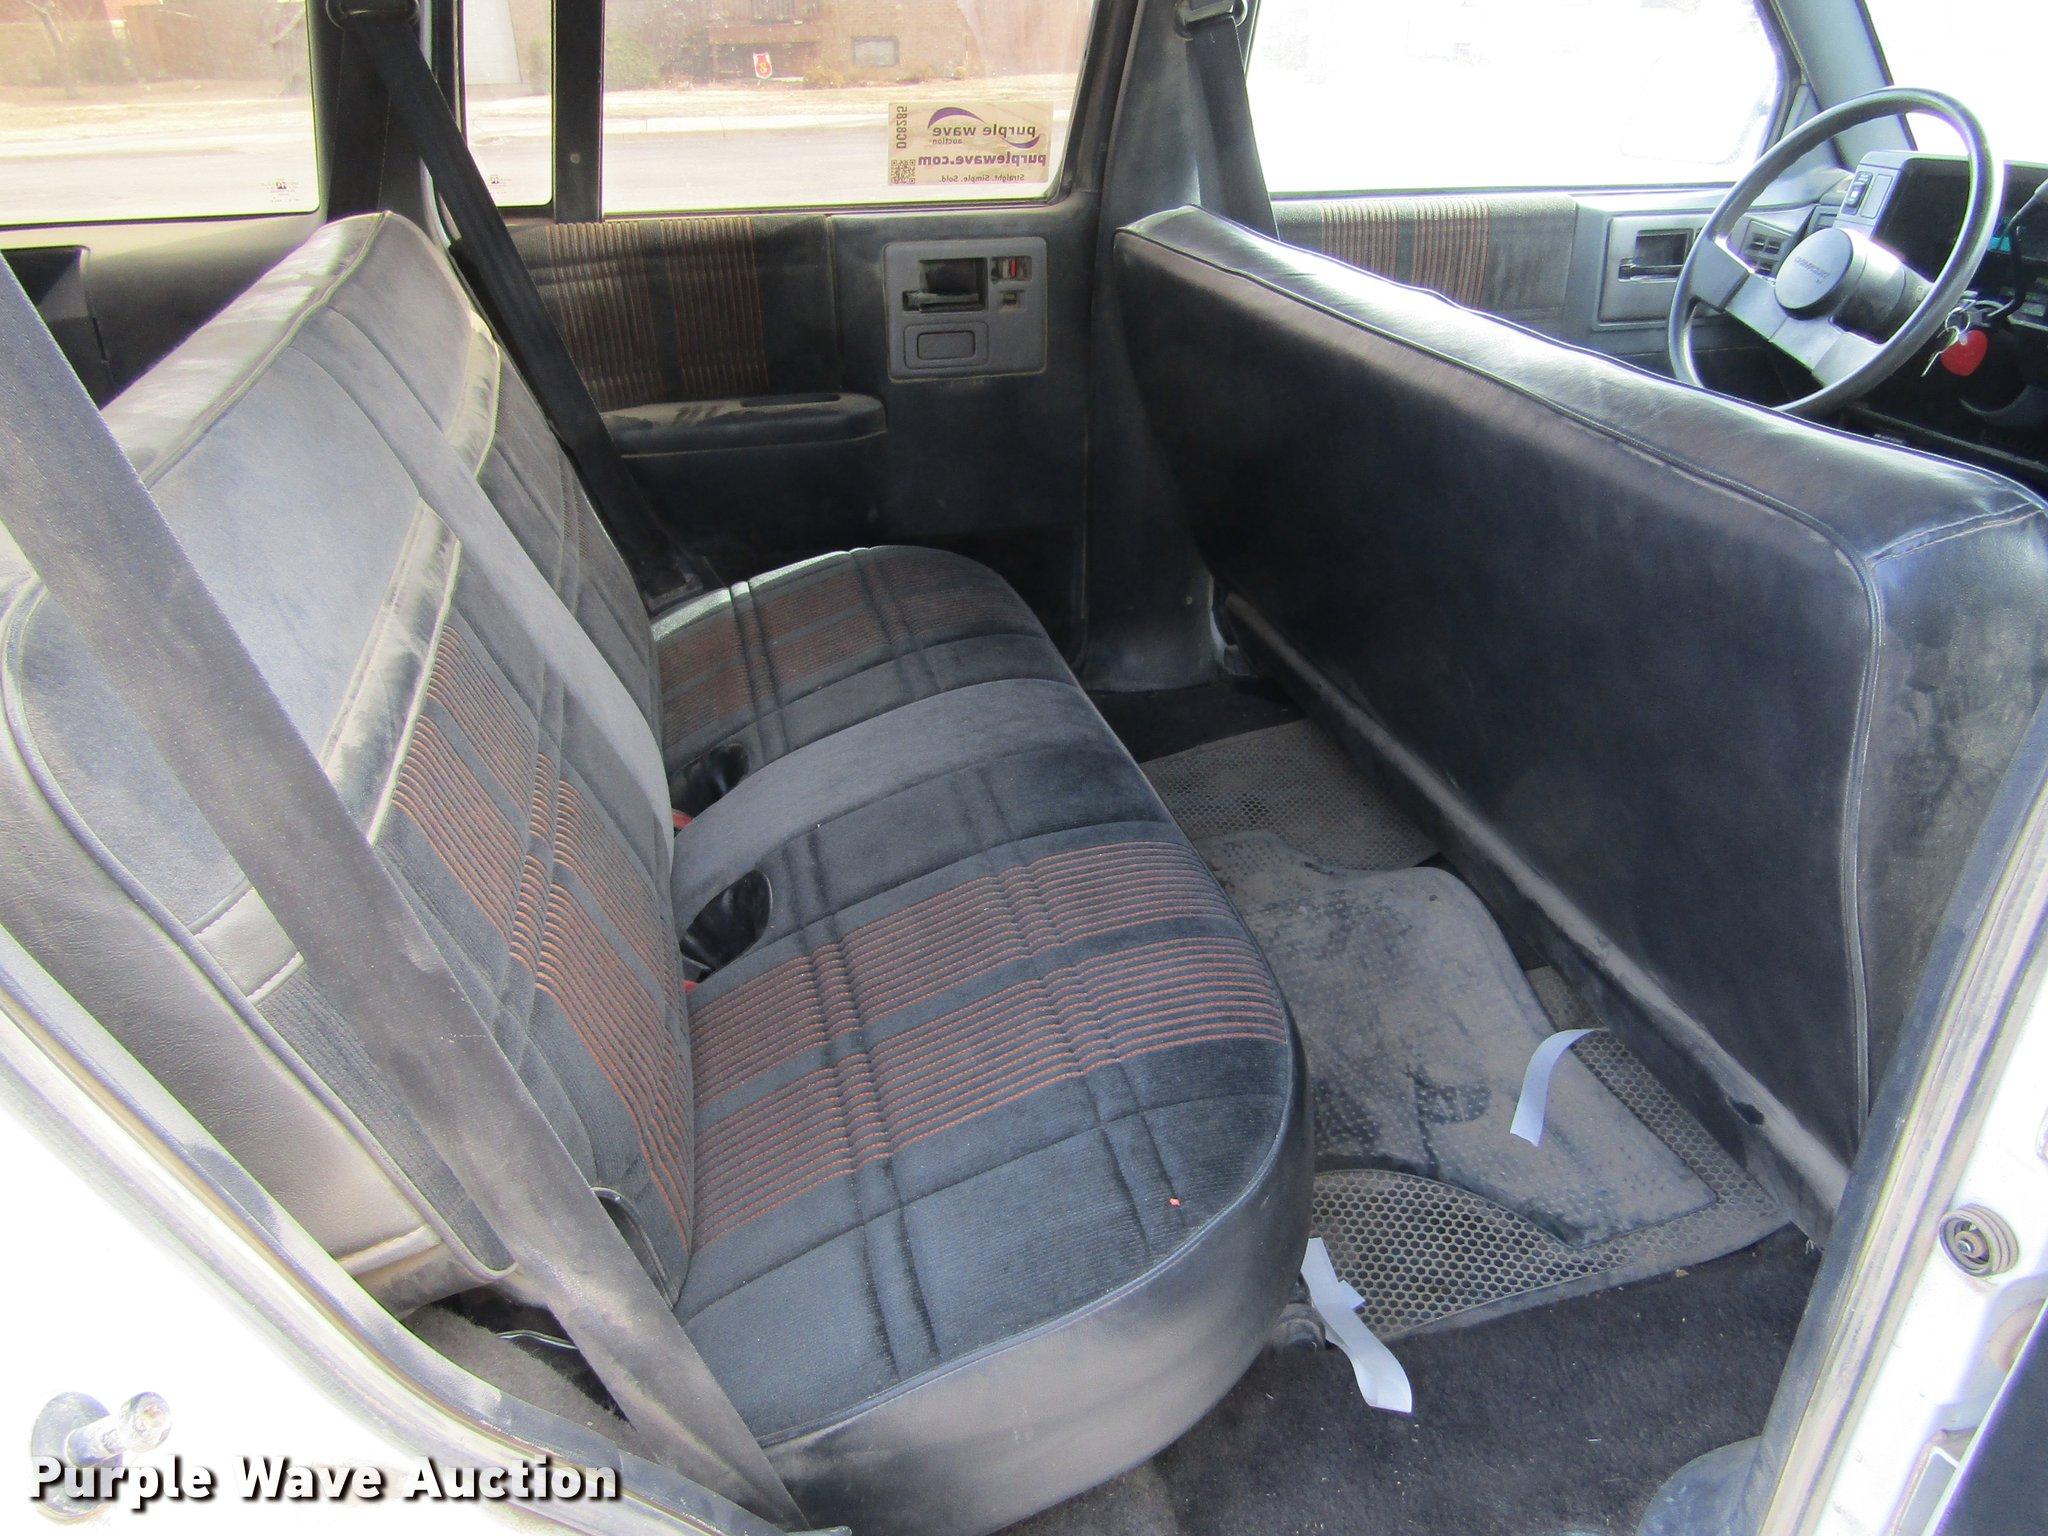 1991 Chevrolet S10 Blazer SUV   Item DC8285   SOLD! March 6